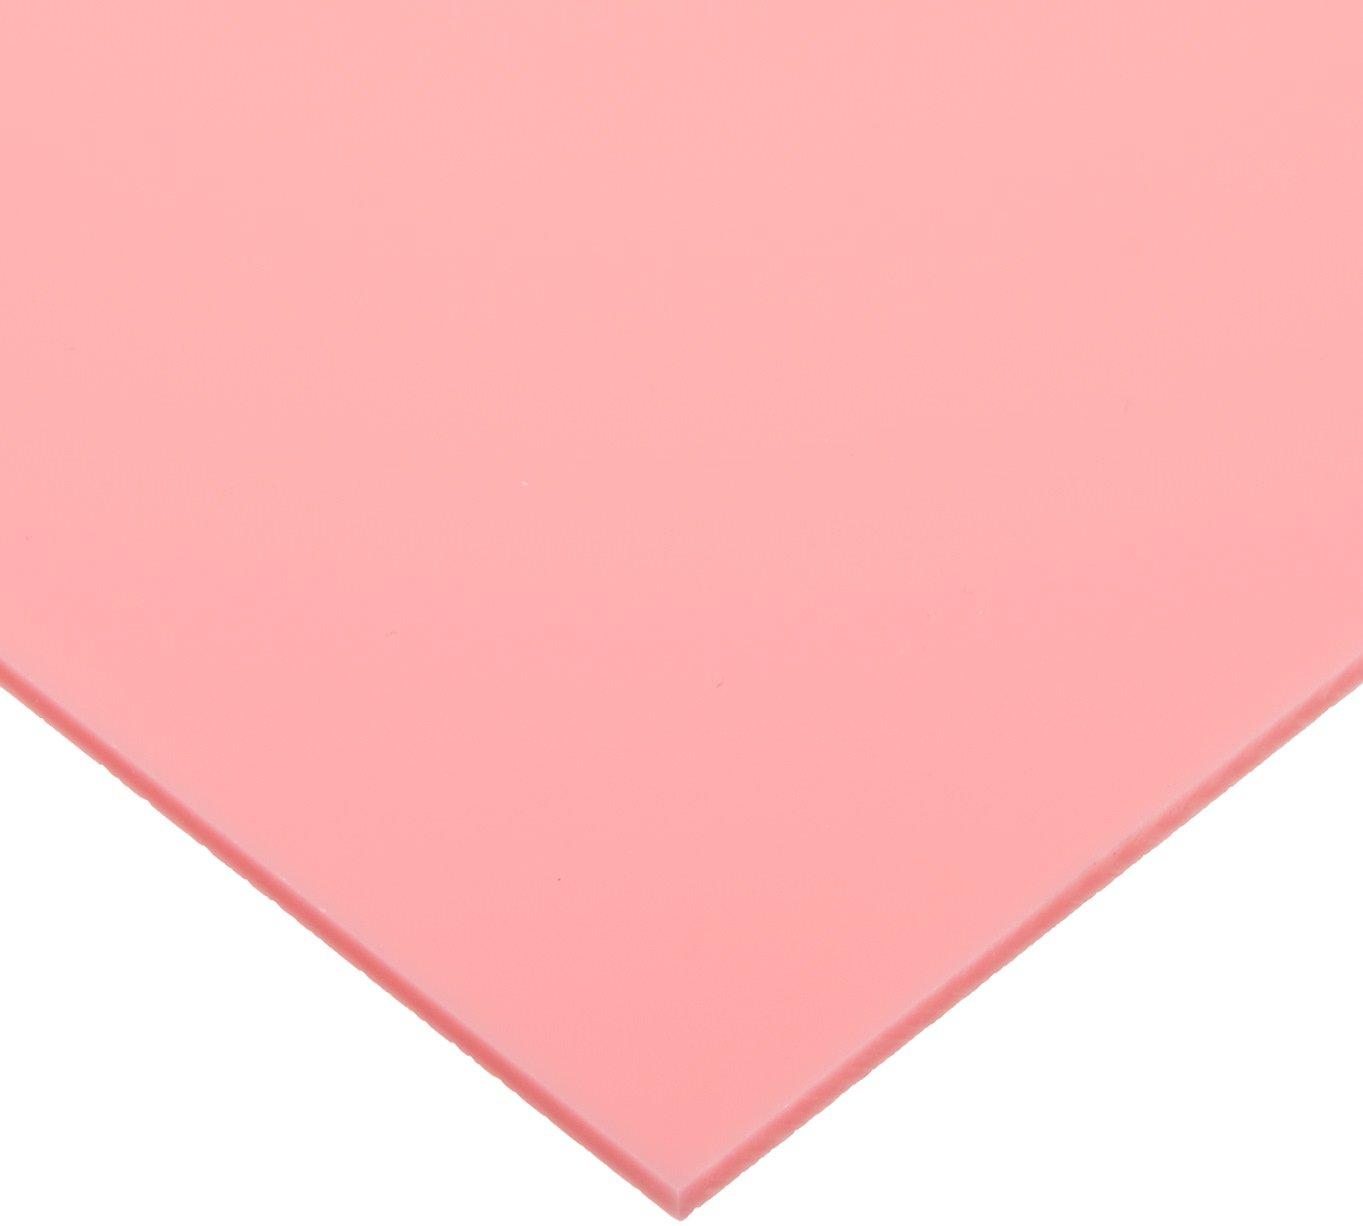 Cast Acrylic Sheet, Translucent Pink, 12' x 12' x 0.118' Size 12 x 12 x 0.118 Size Plastics 2000 904983